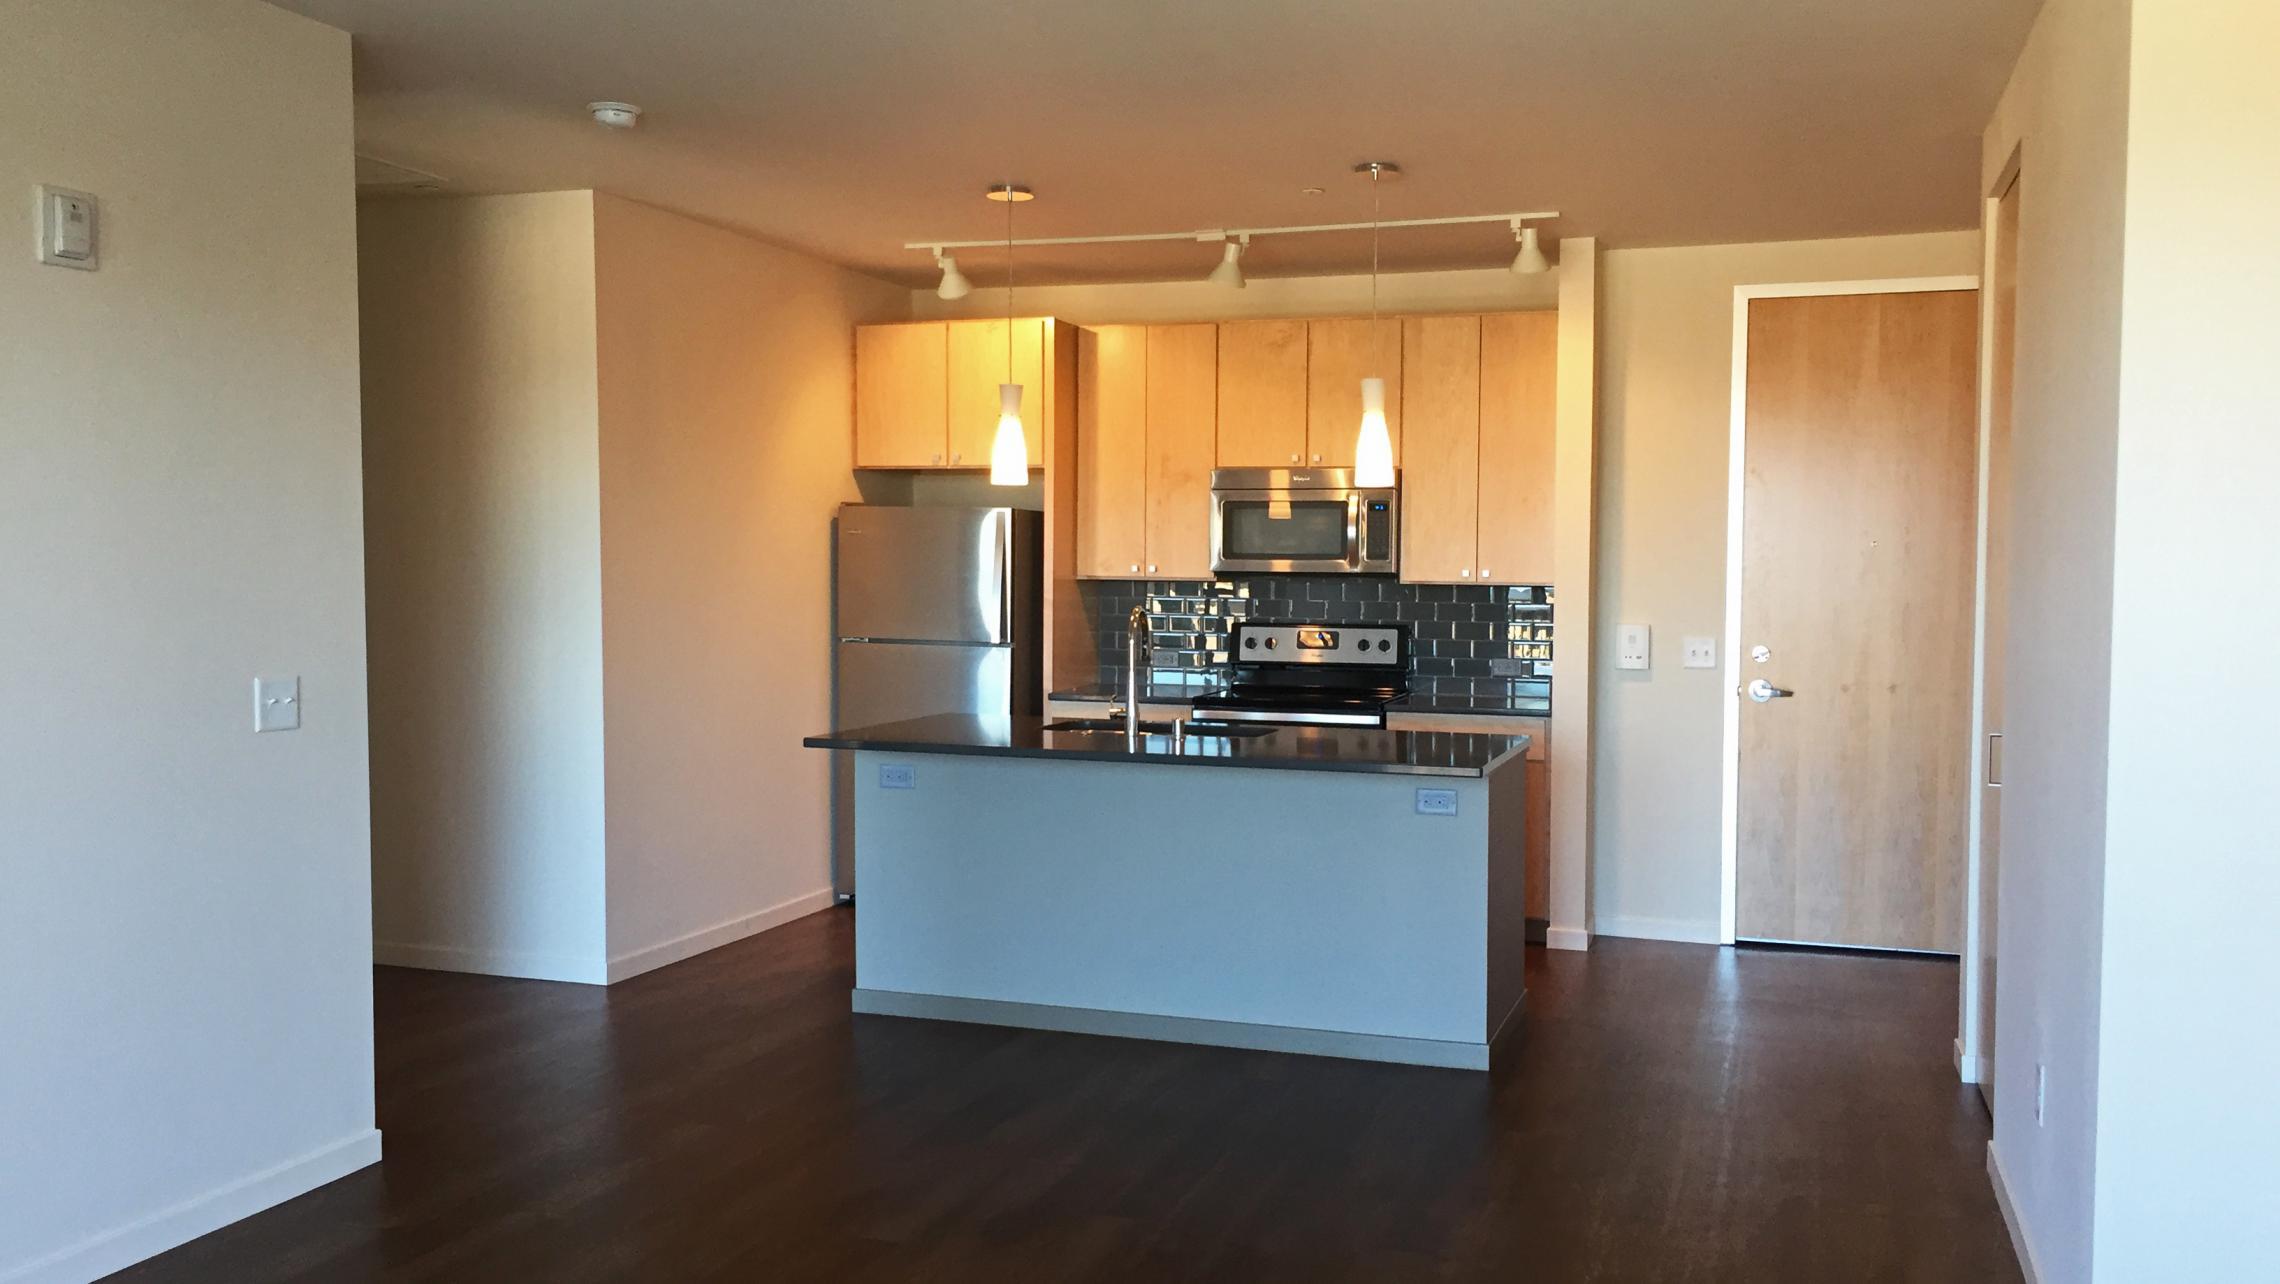 ULI Nine Line Apartment 521 - Kitchen